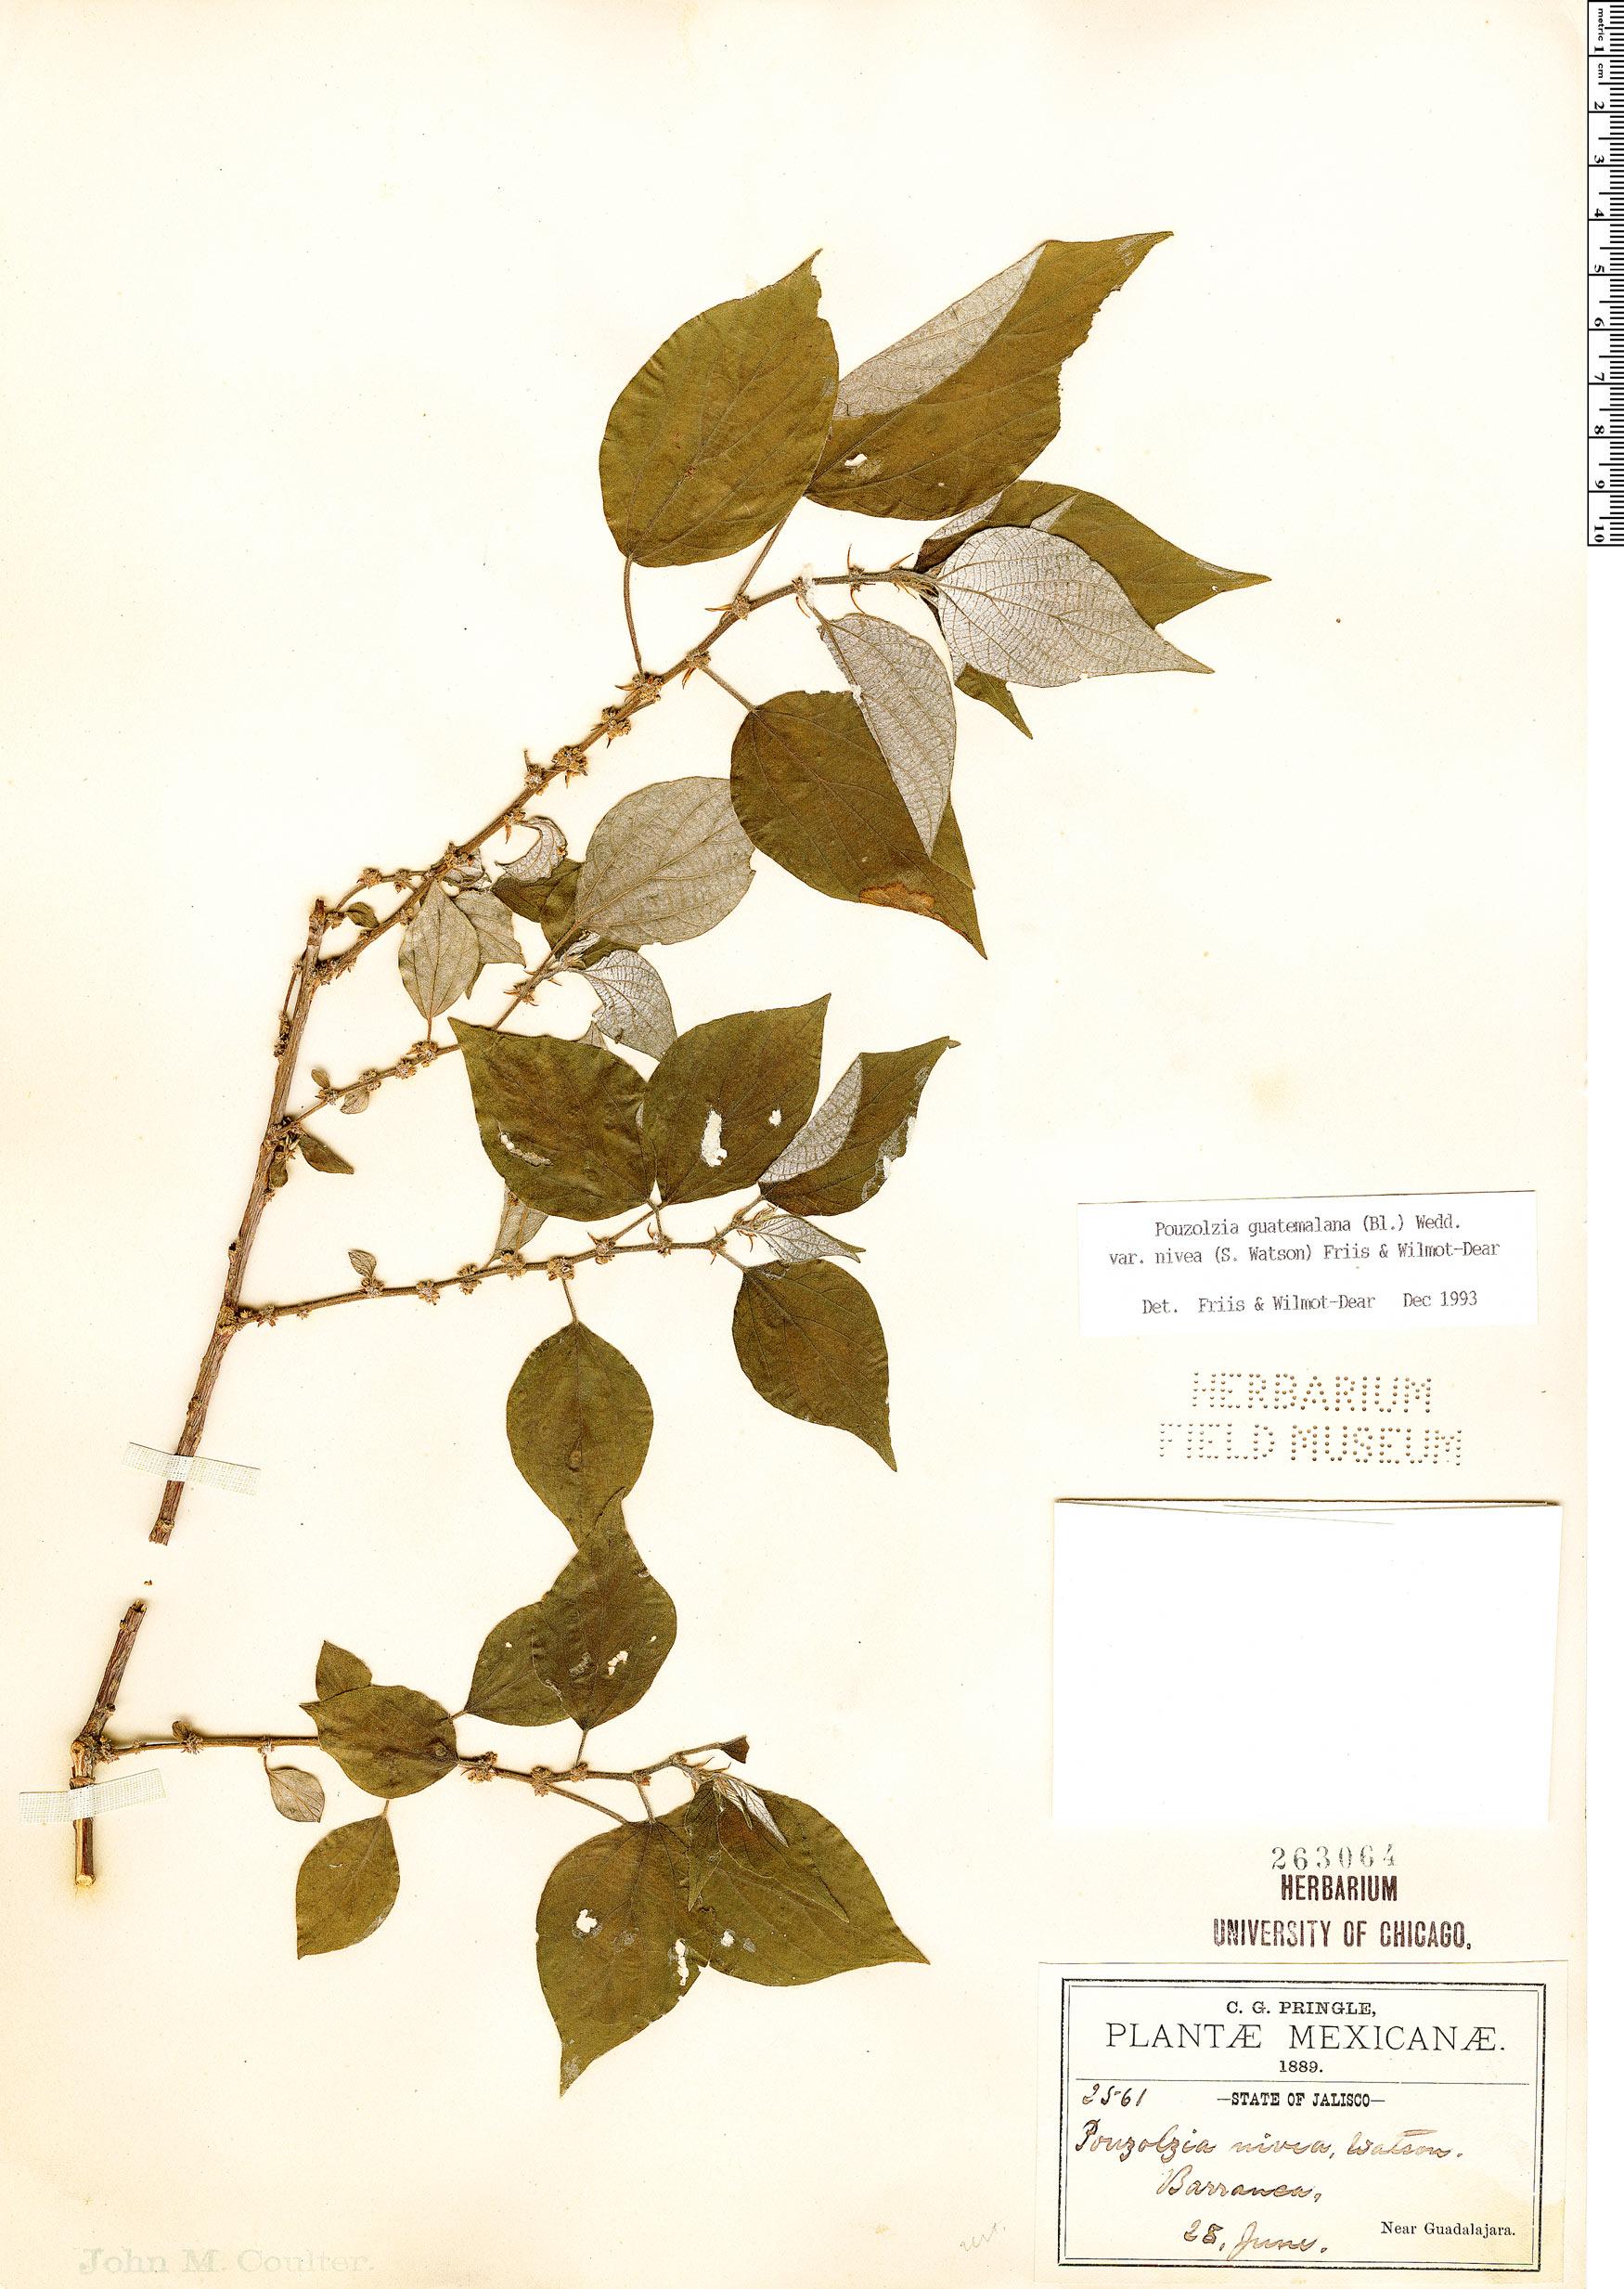 Specimen: Pouzolzia guatemalana